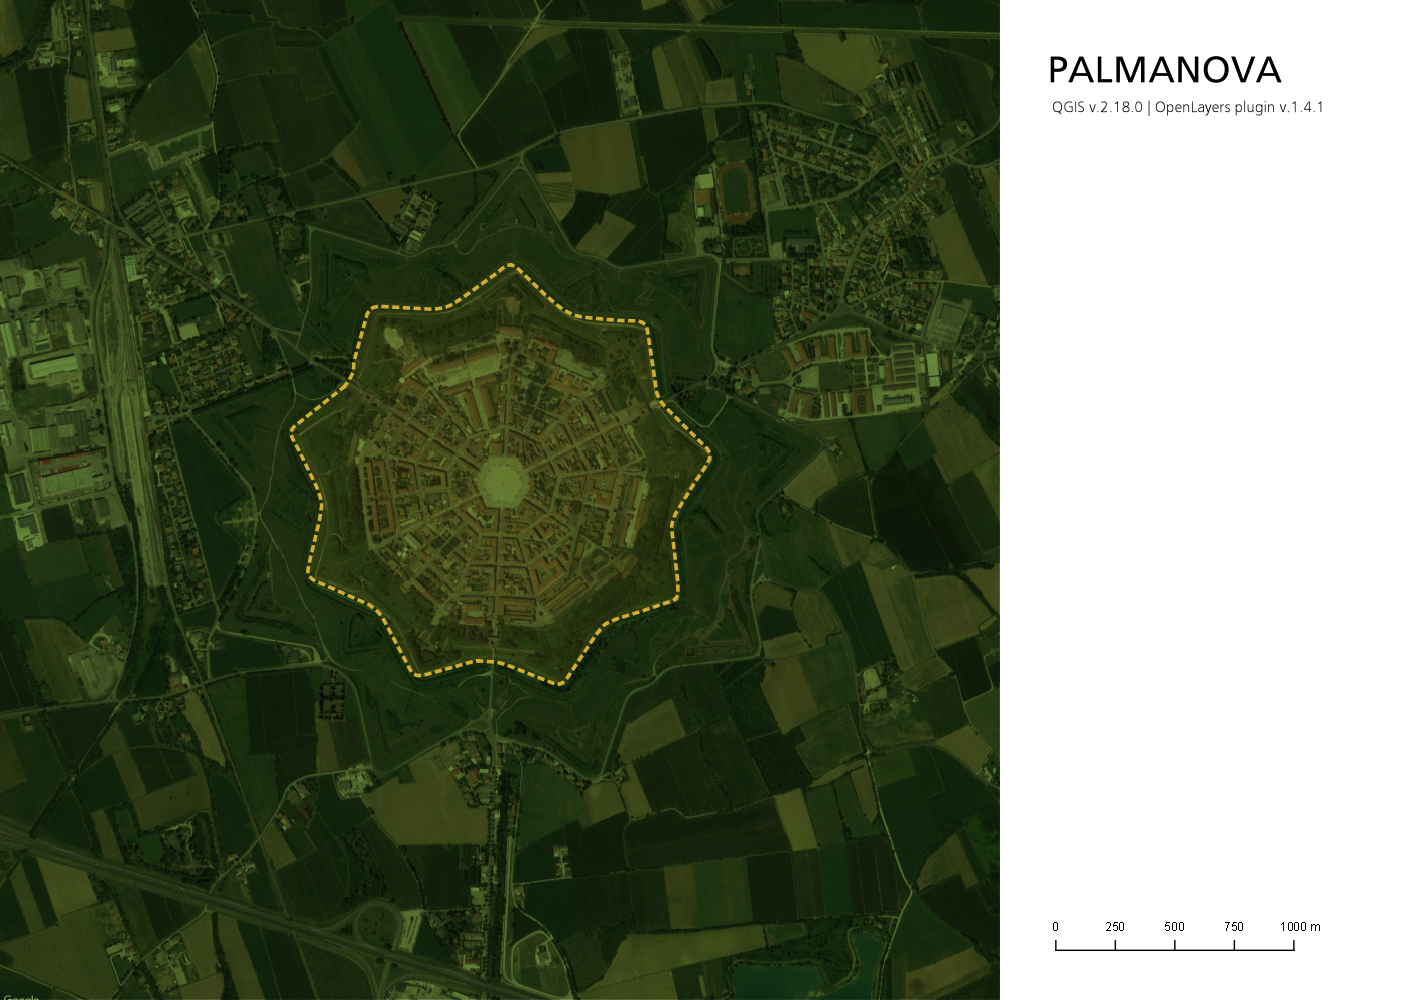 Planimetria di Palmanova in QGis senza errori con l'ortofoto al vivo